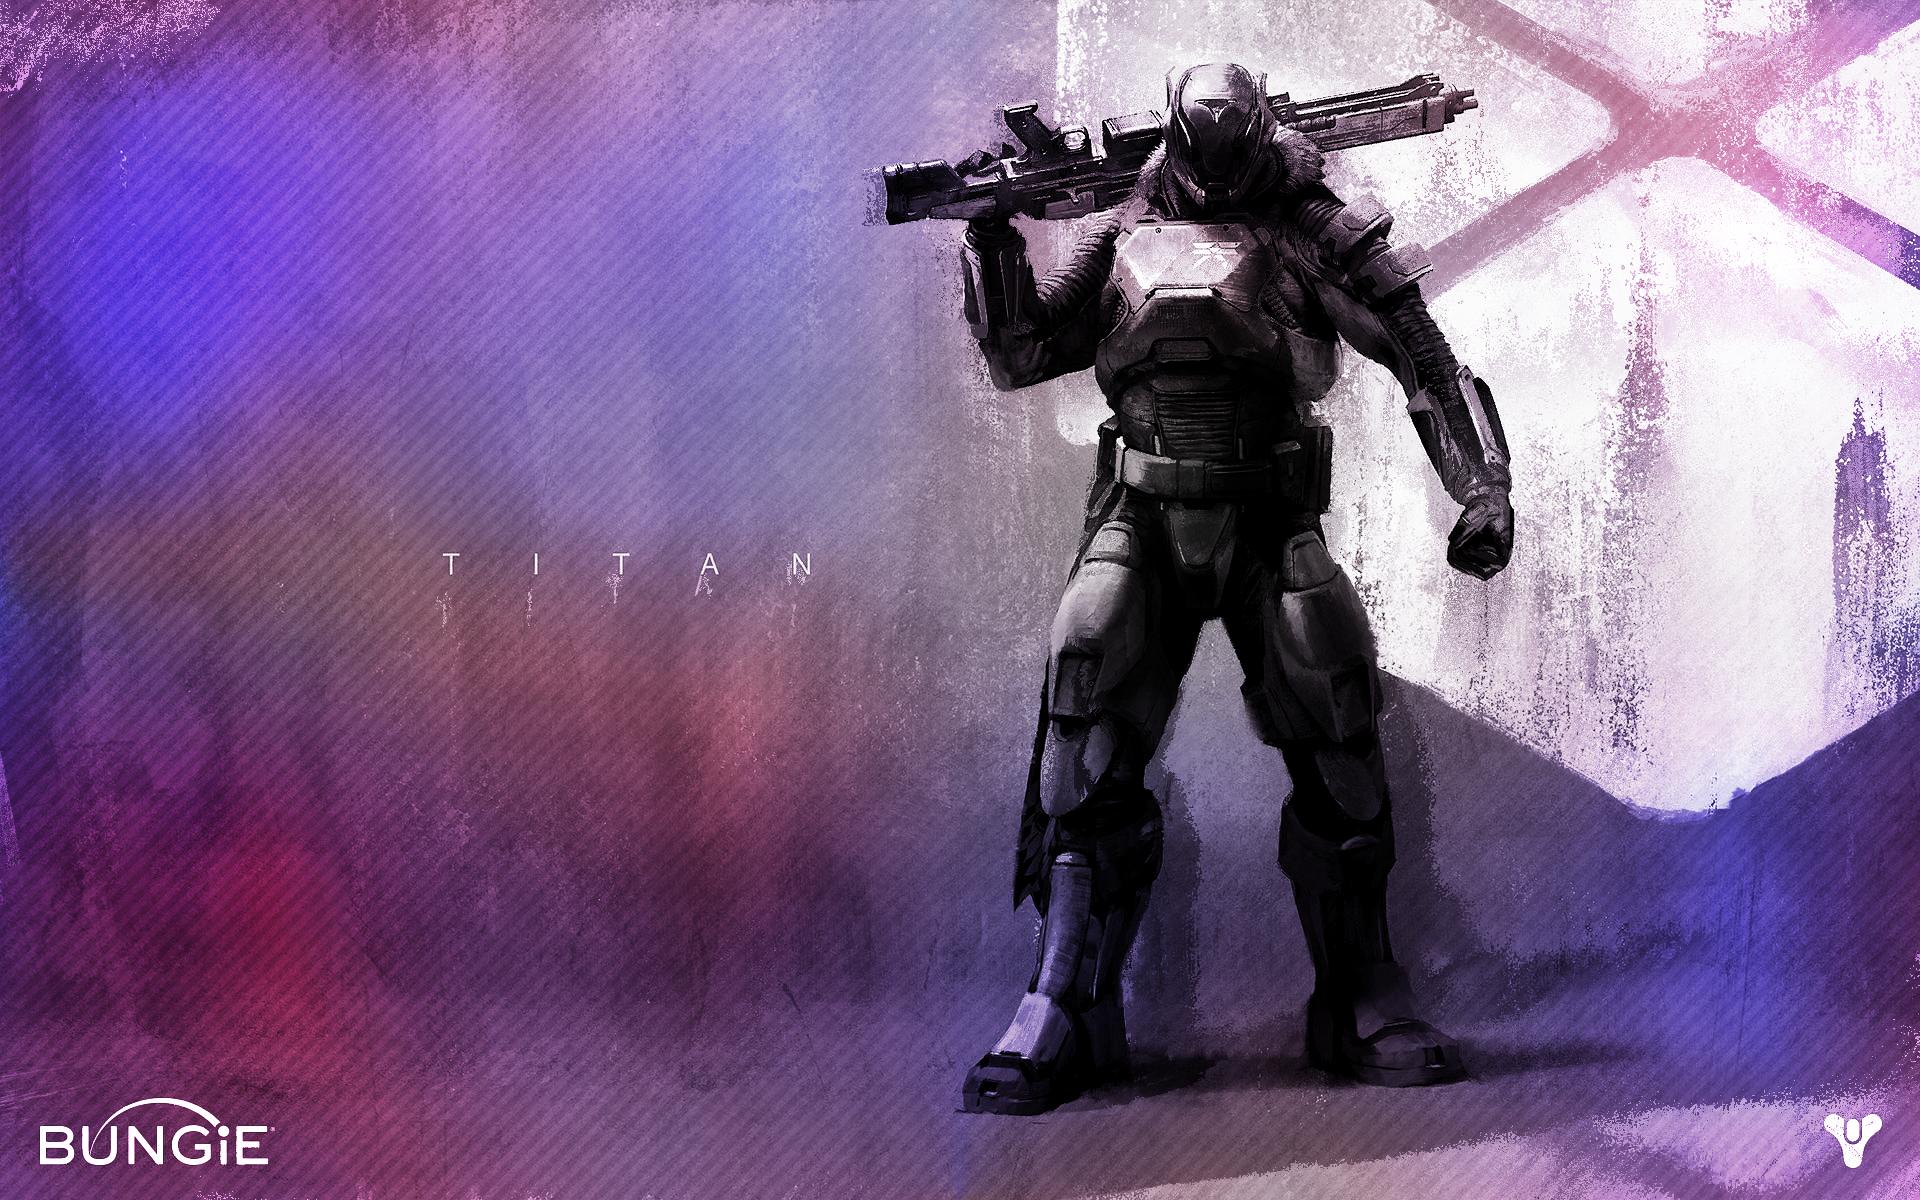 Destiny Wallpaper Titan - WallpaperSafari